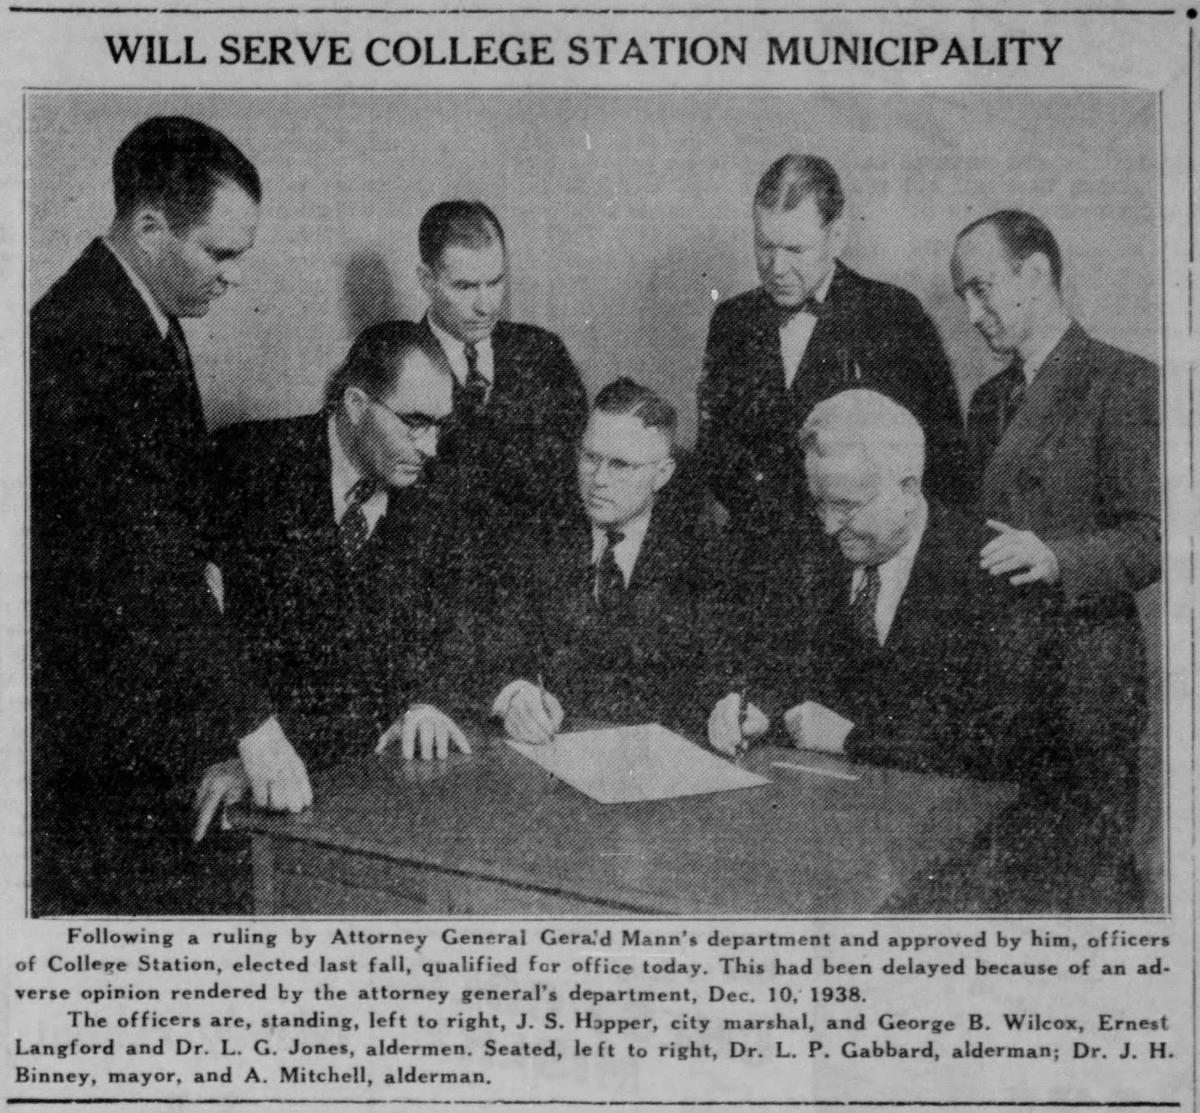 The Eagle Archives, Feb. 24, 1939